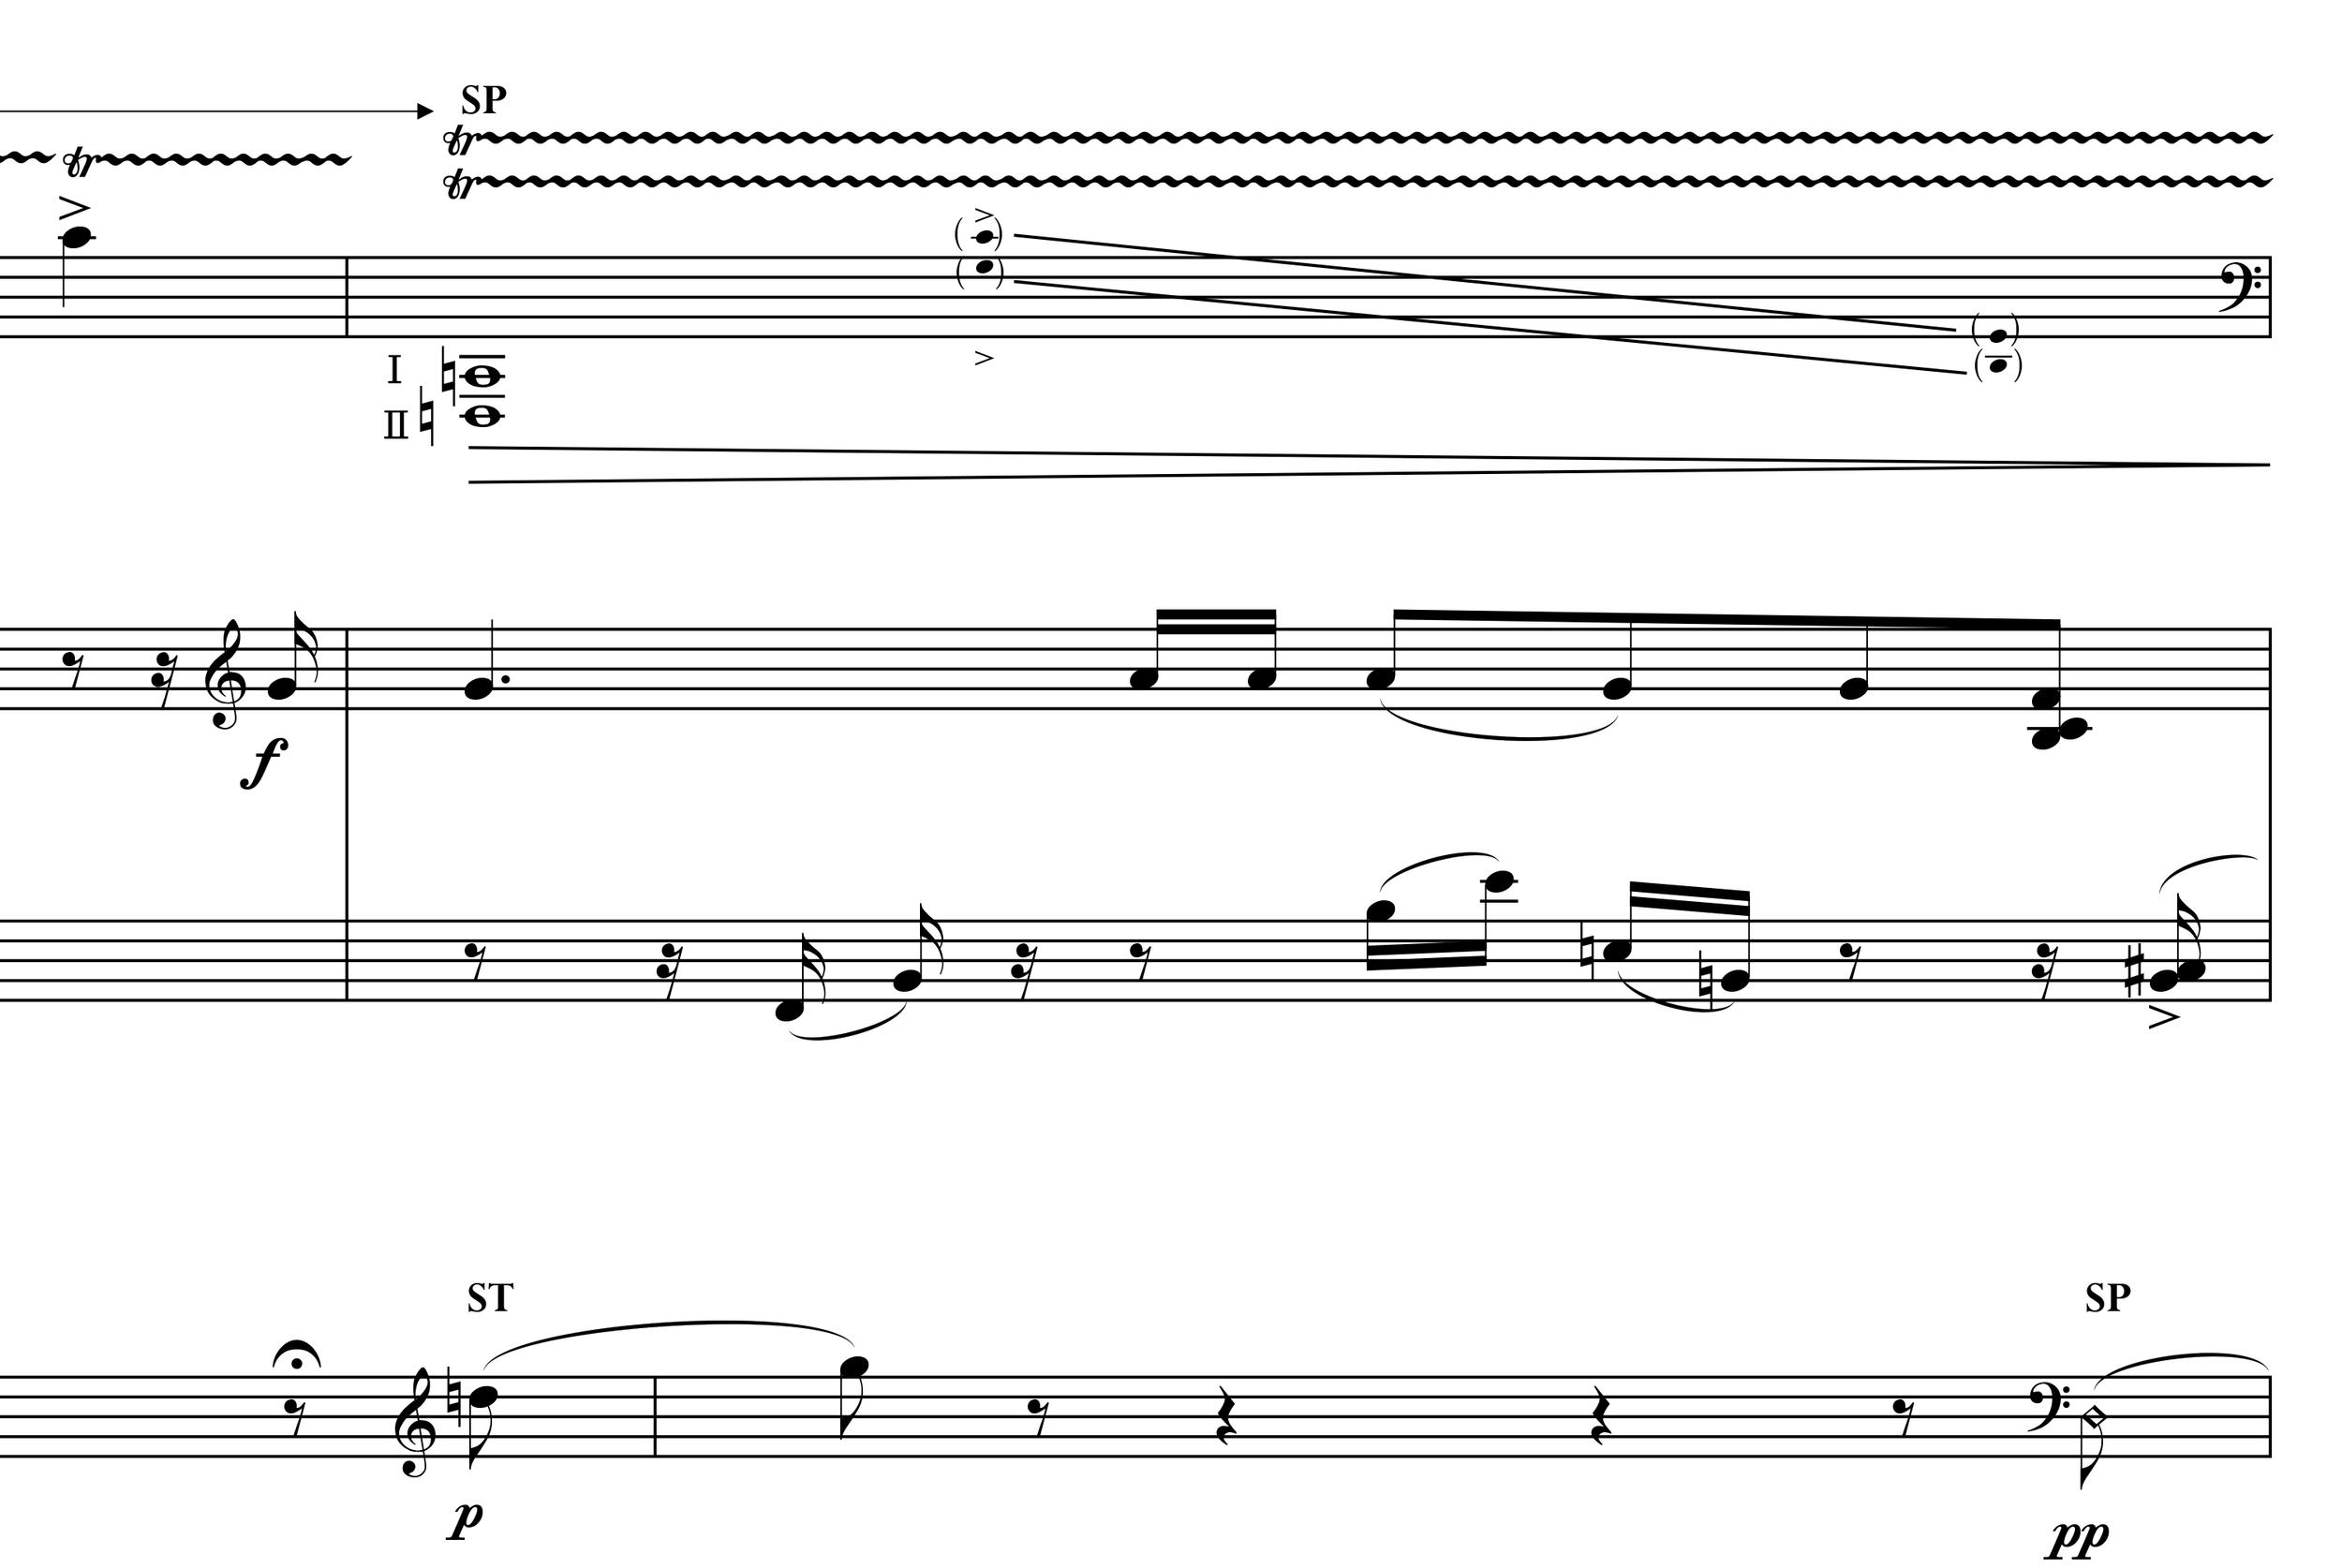 Mayse, Jon Sonata for Cello and Piano Score-10.png